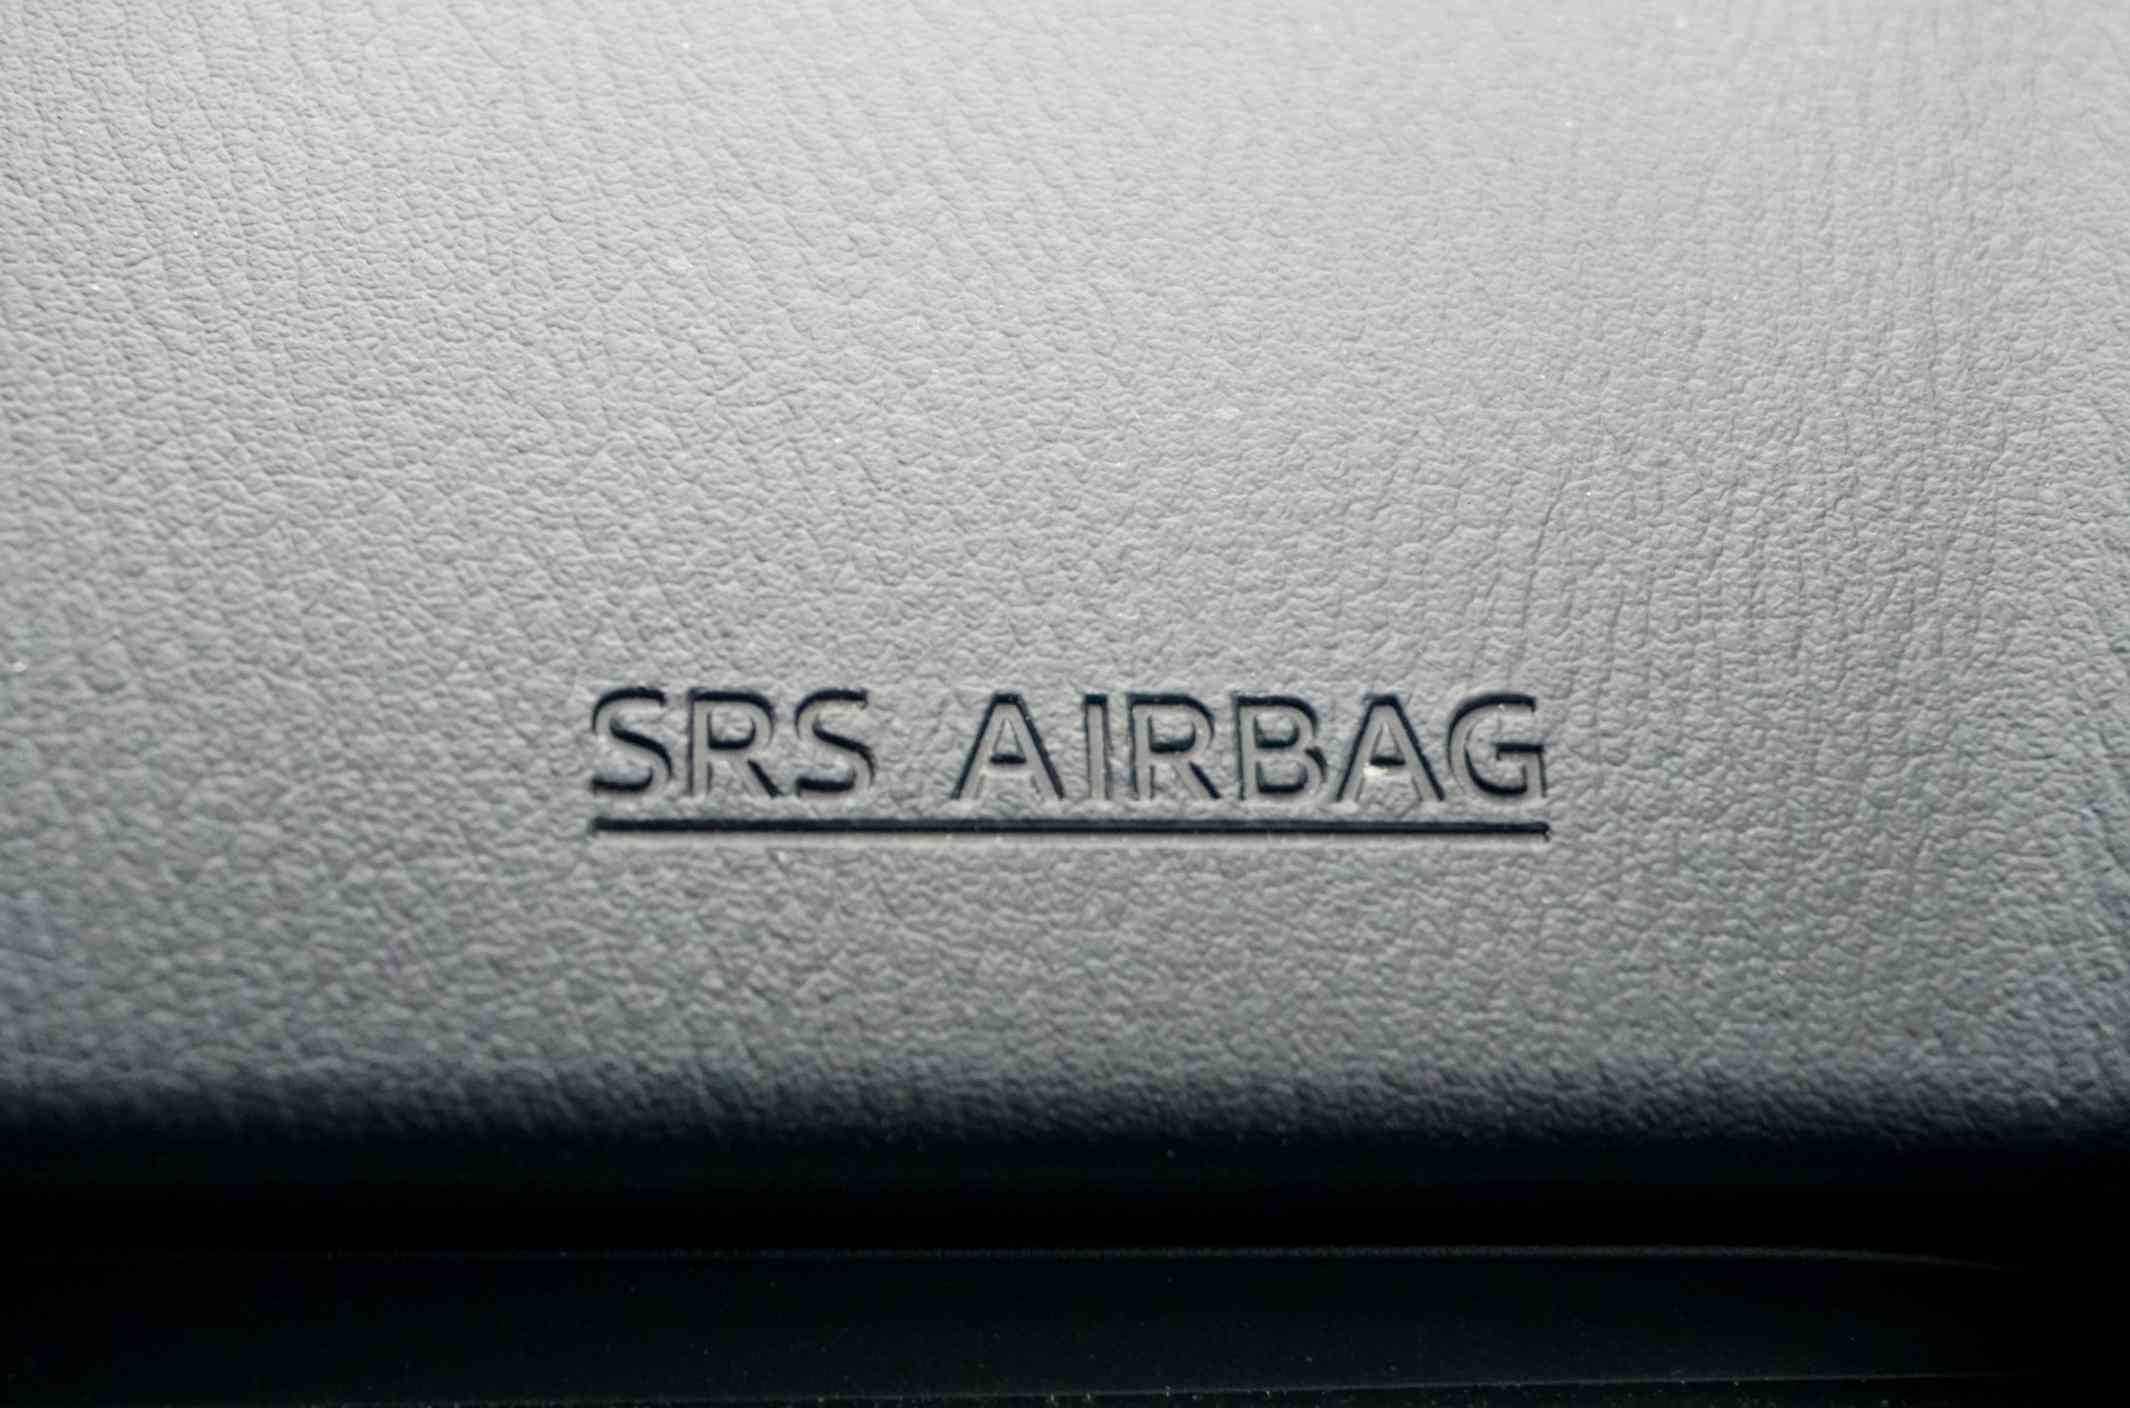 Airbag branding in car